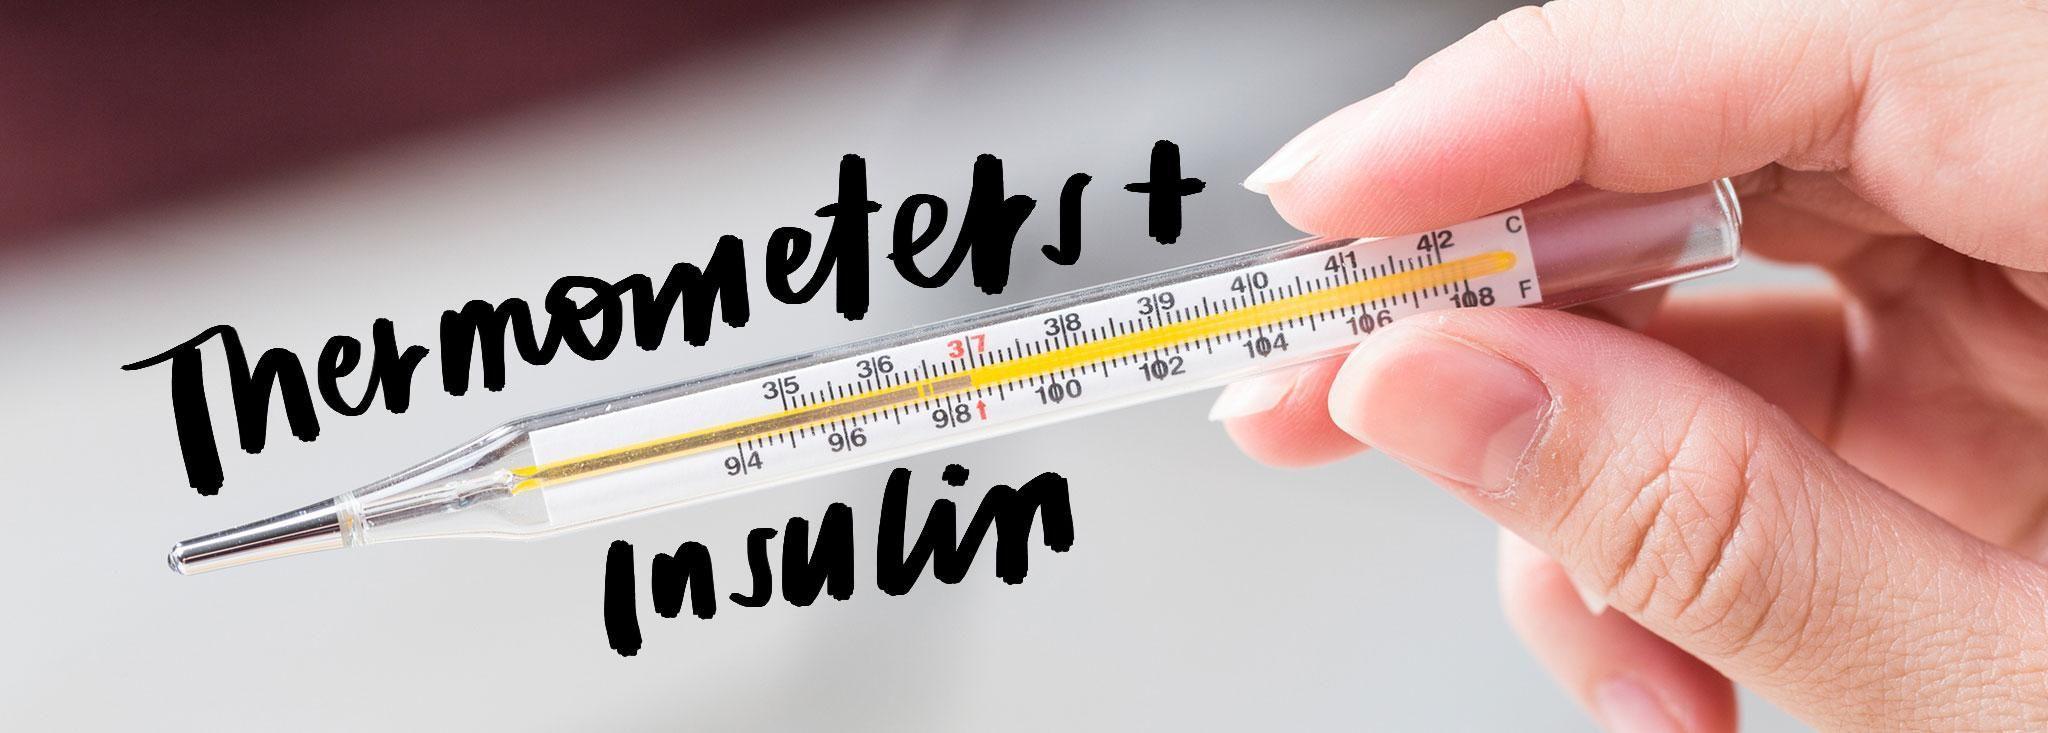 Is Insulin Stored In The Fridge?